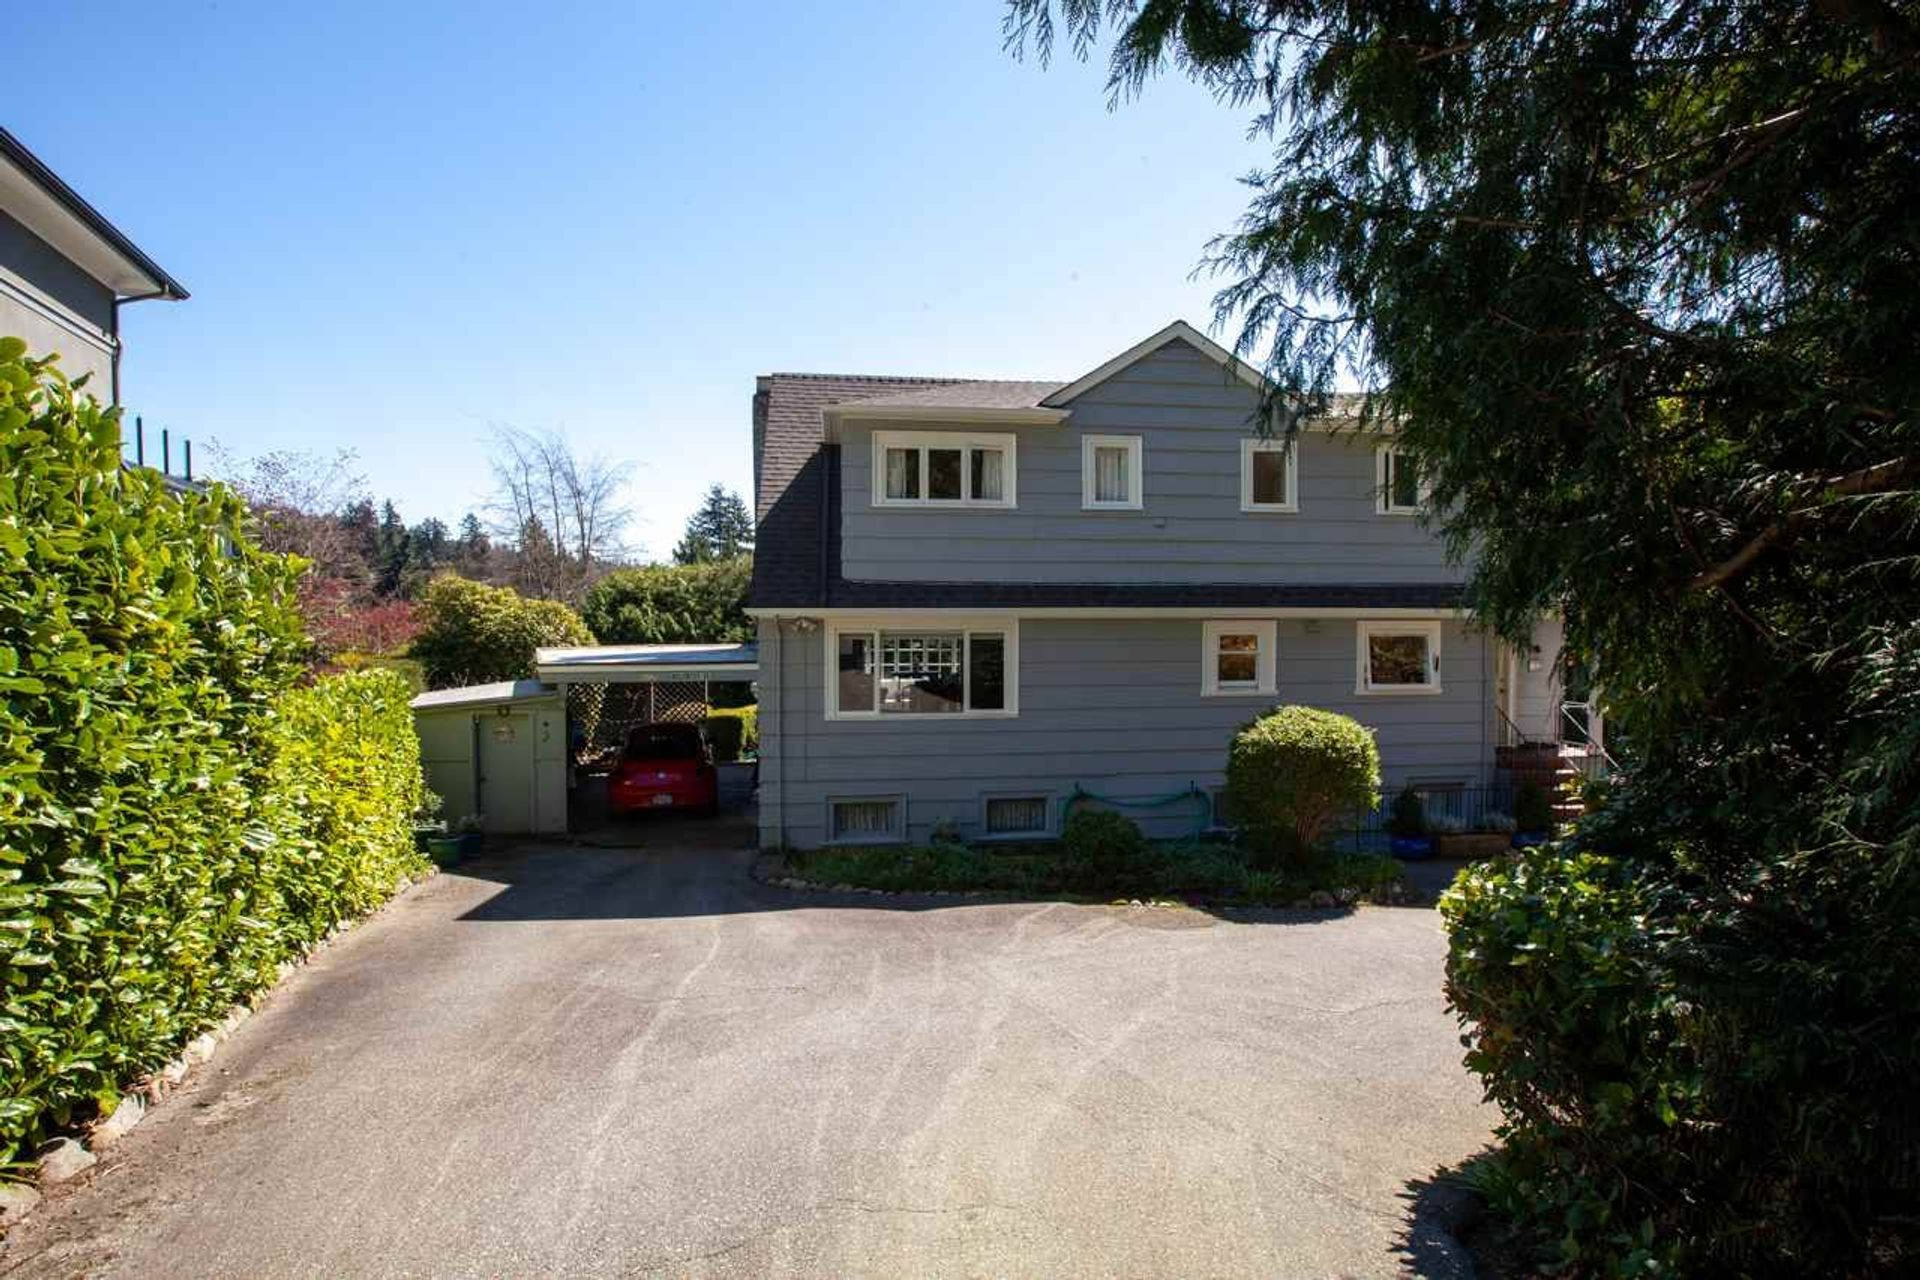 412-hillcrest-street-westmount-wv-west-vancouver-03 at 412 Hillcrest Street, Westmount WV, West Vancouver